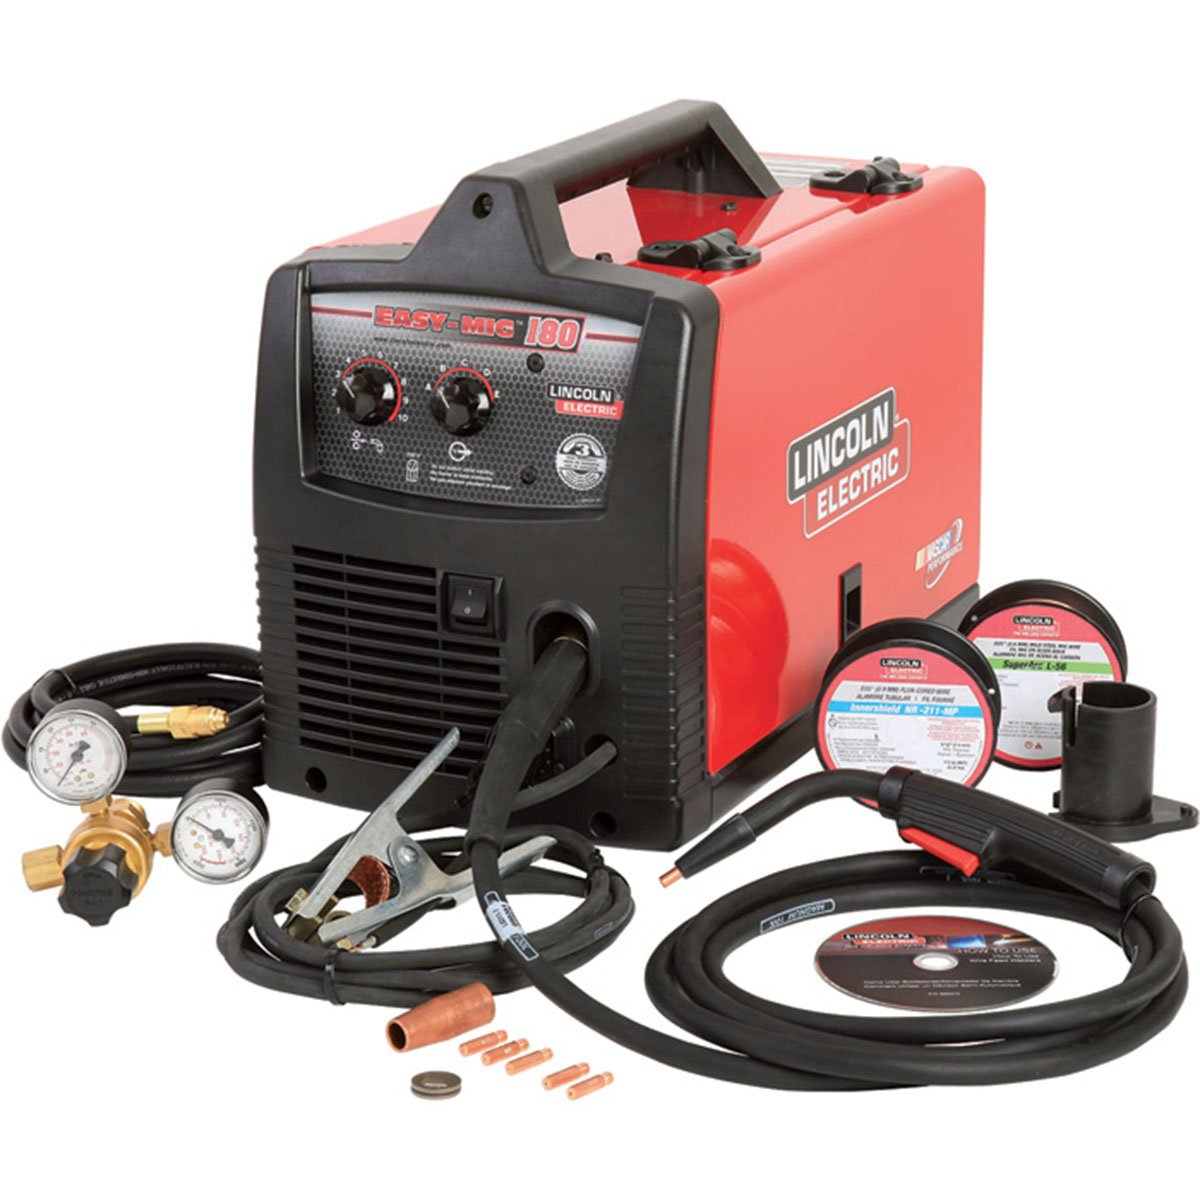 Uno Mig Welder Parts Lincoln Electric Easy Flux Core 1200x1200